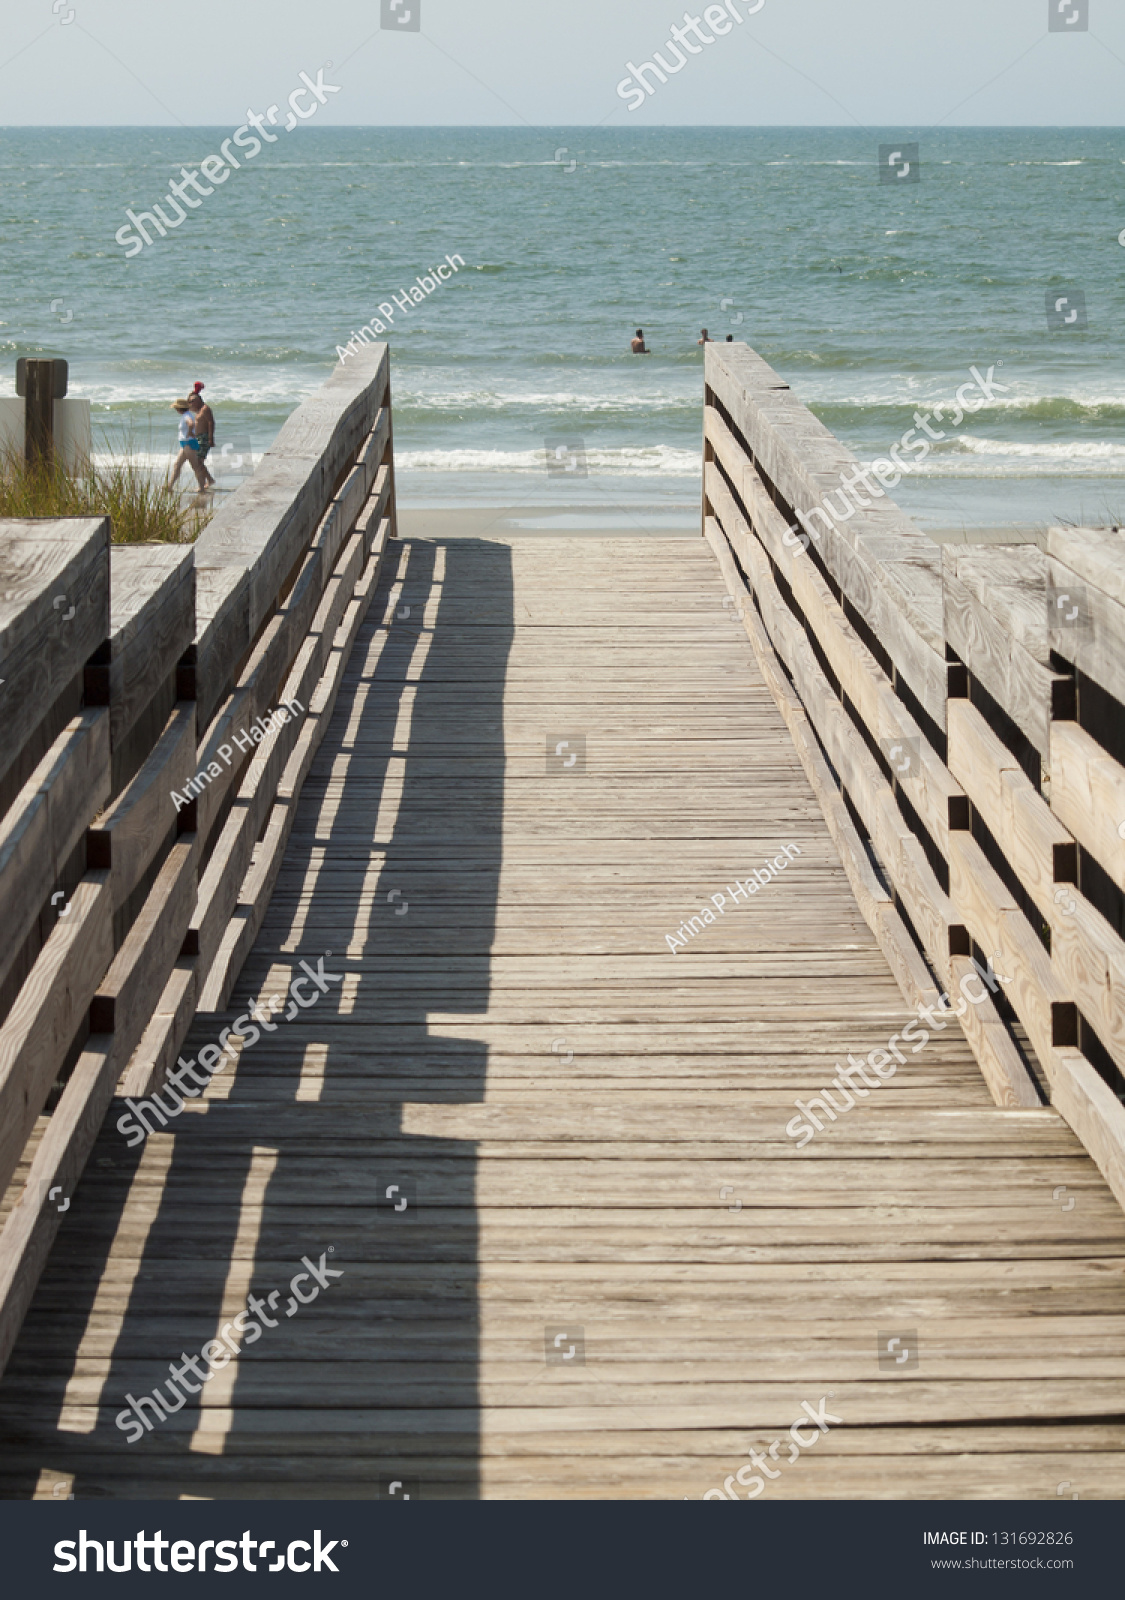 Myrtle Beach A Coastal City In South Carolina: Myrtle Beach Is A Coastal City On The East Coast Of The